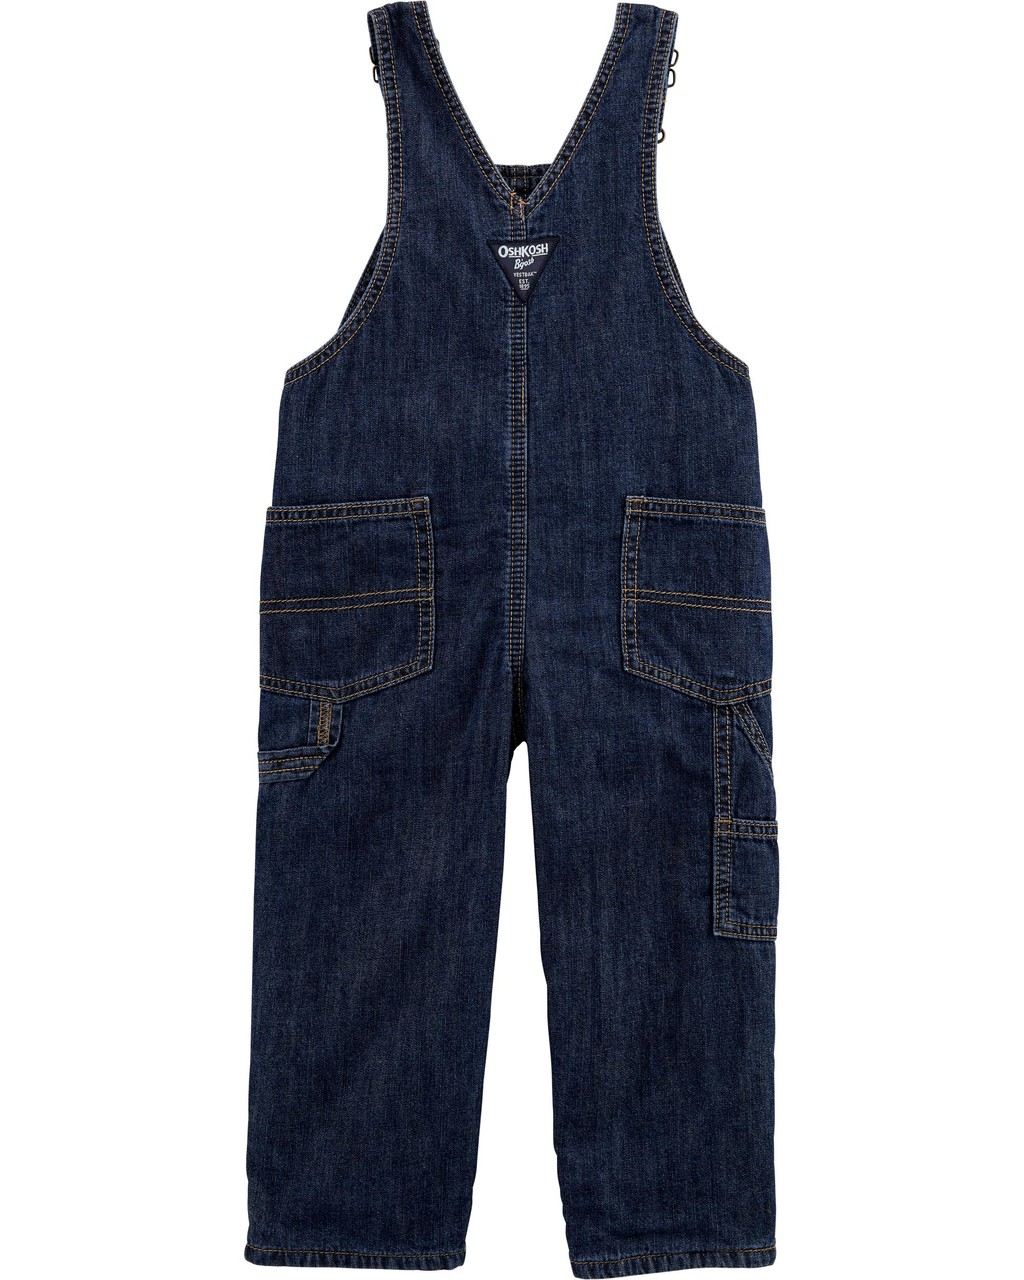 Jardineira Jeans Forrada Oshkosh